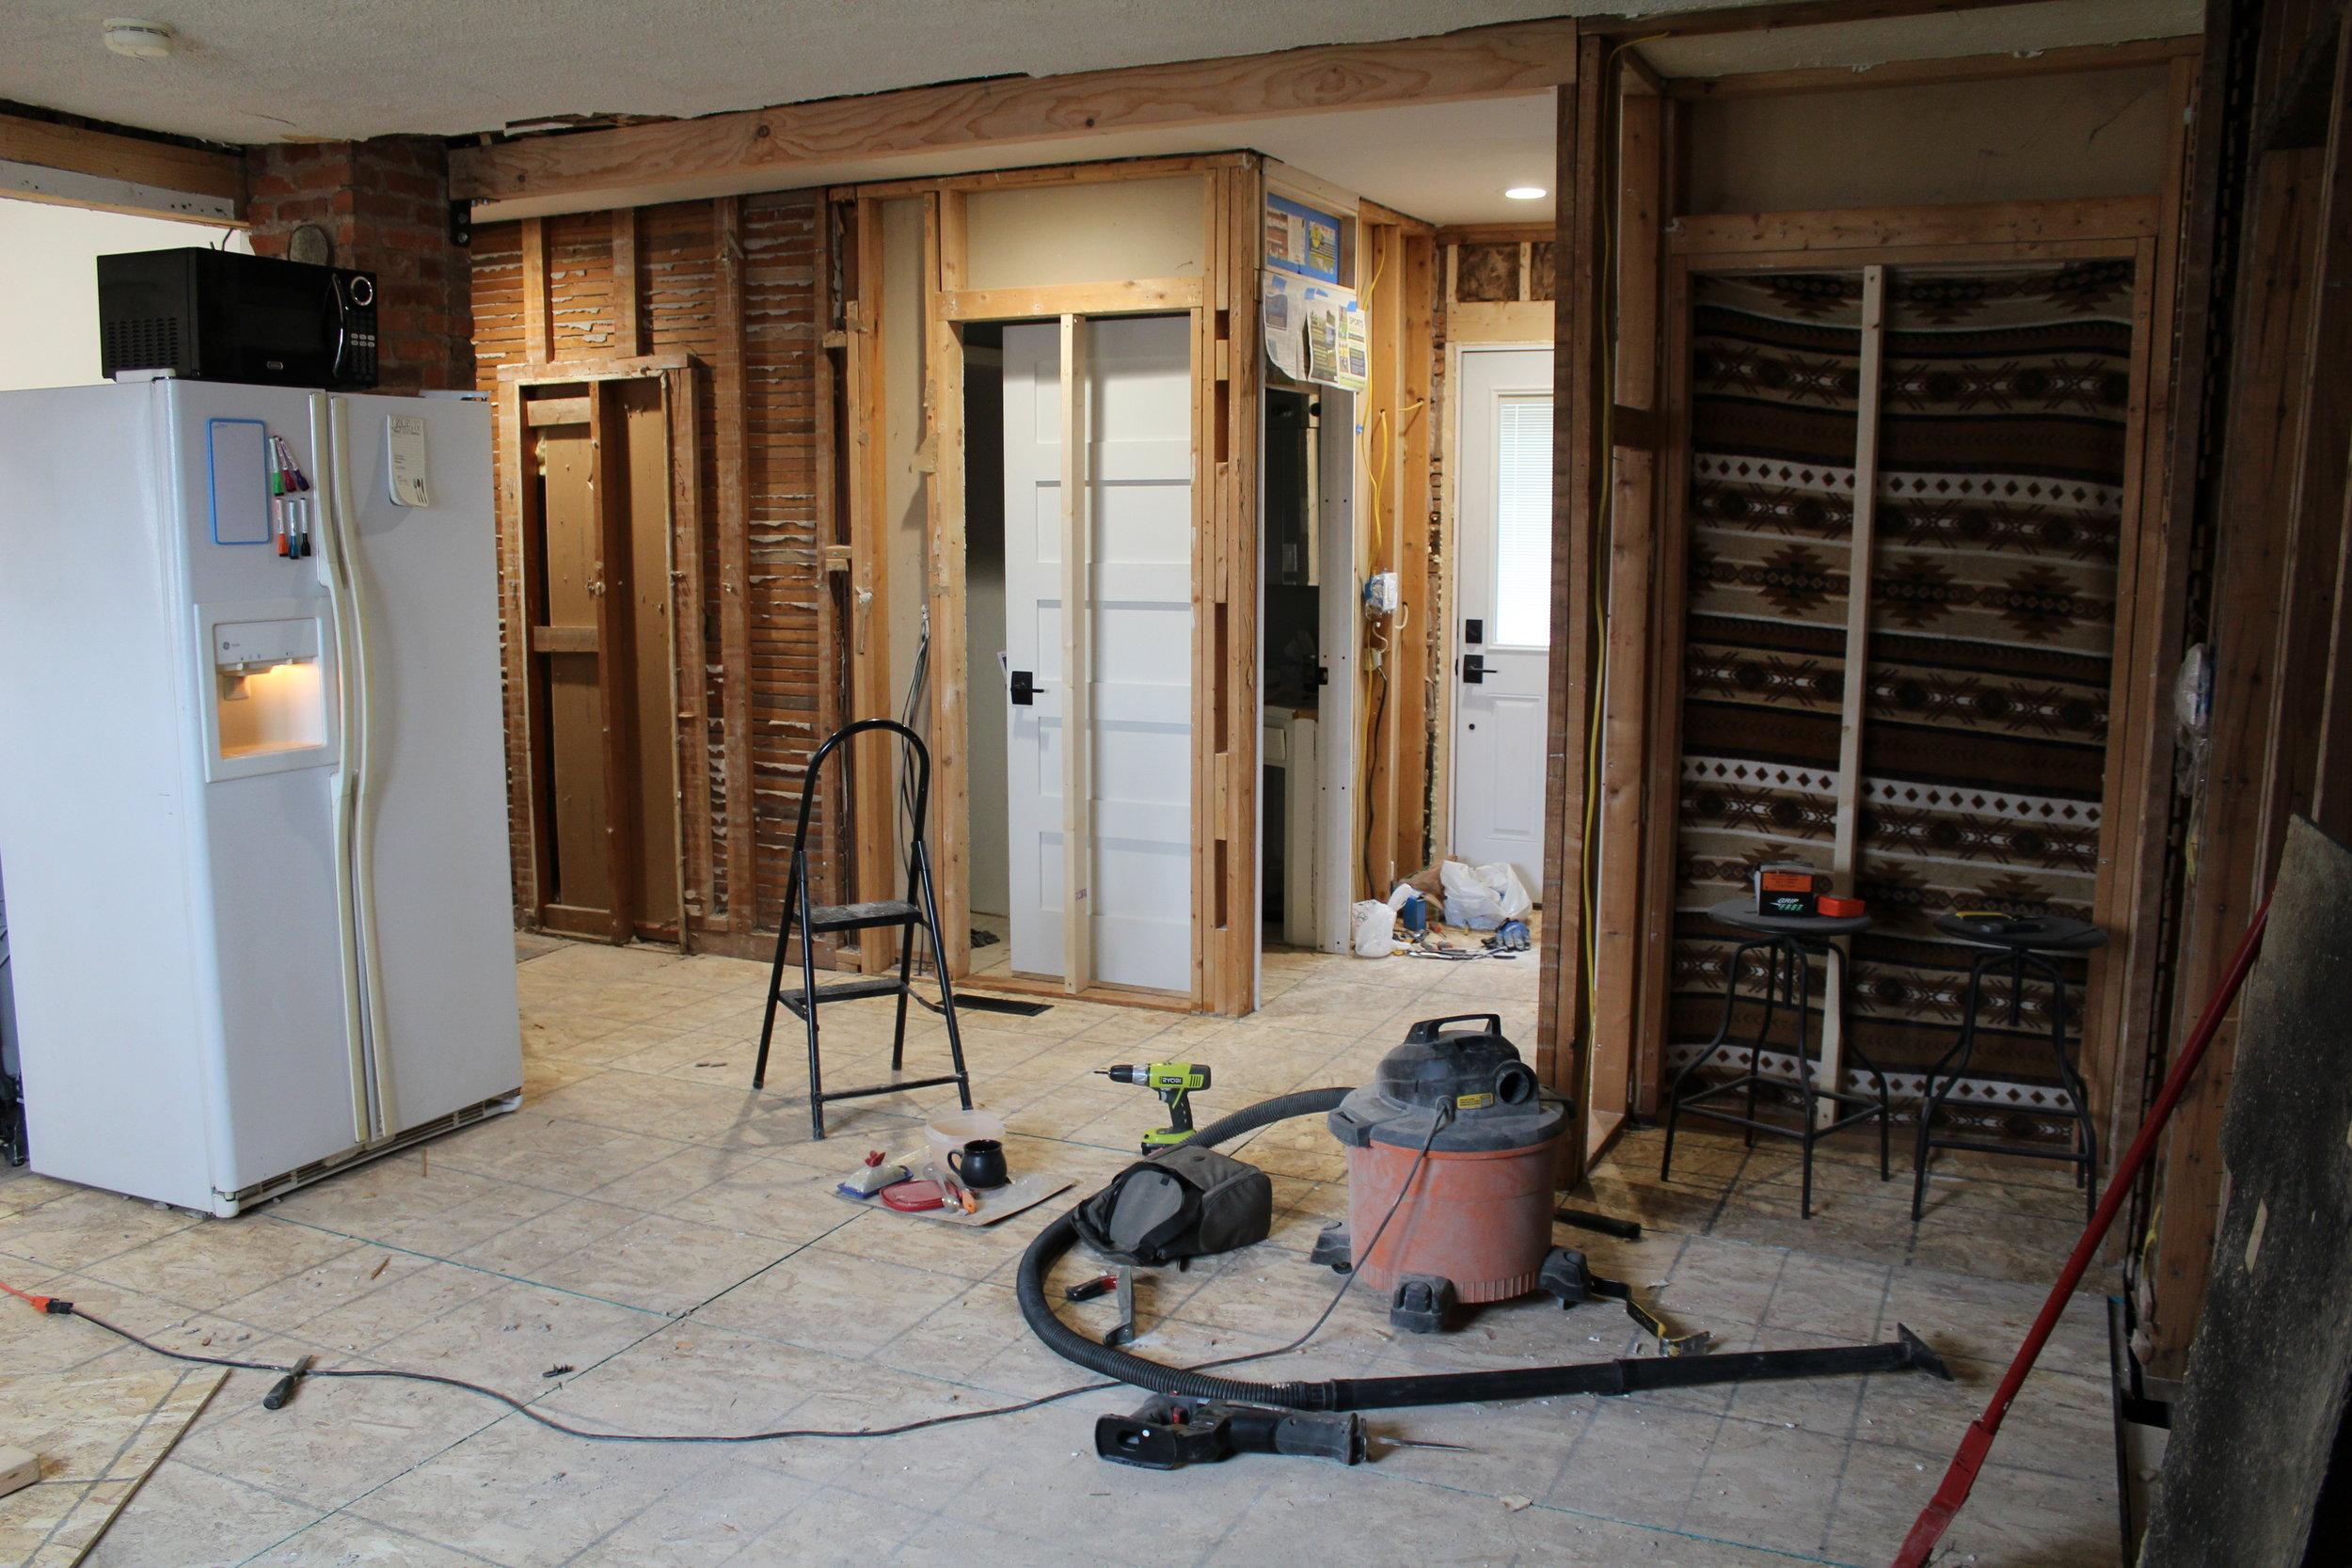 Kitchen and hallway - I spy our tiny microwave!